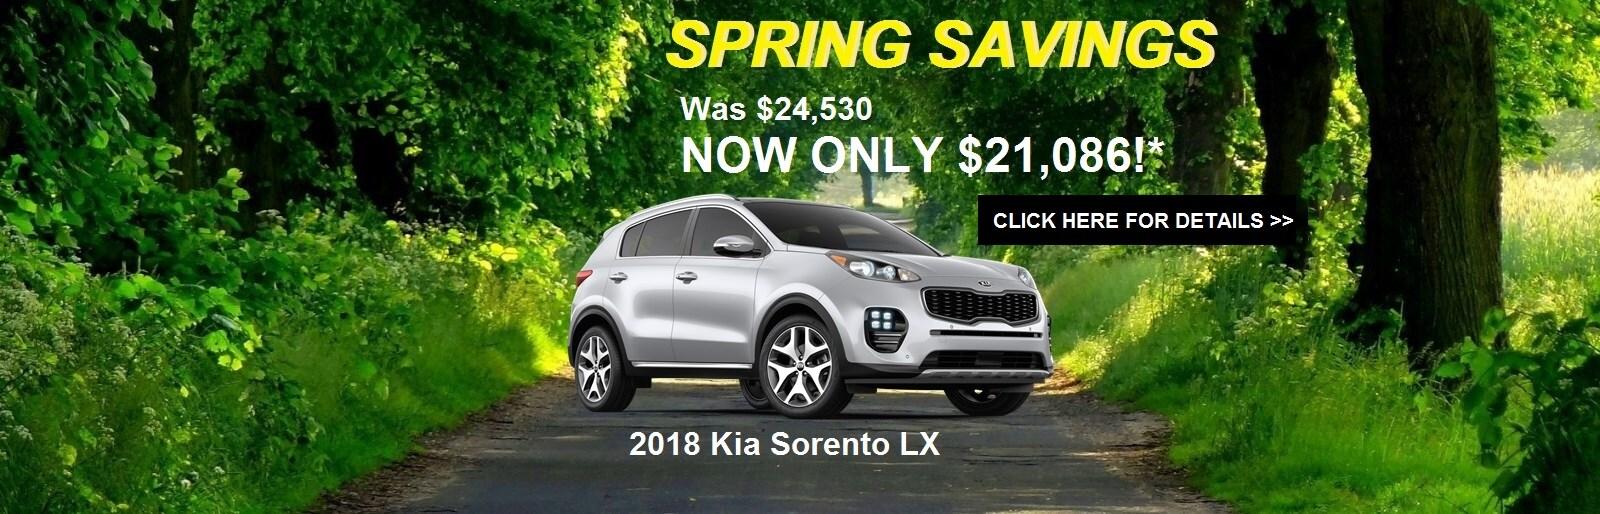 Memorial Day Car Sales 2017 >> Overturf Volkswagen Kia| New & Used Car Dealer in ...